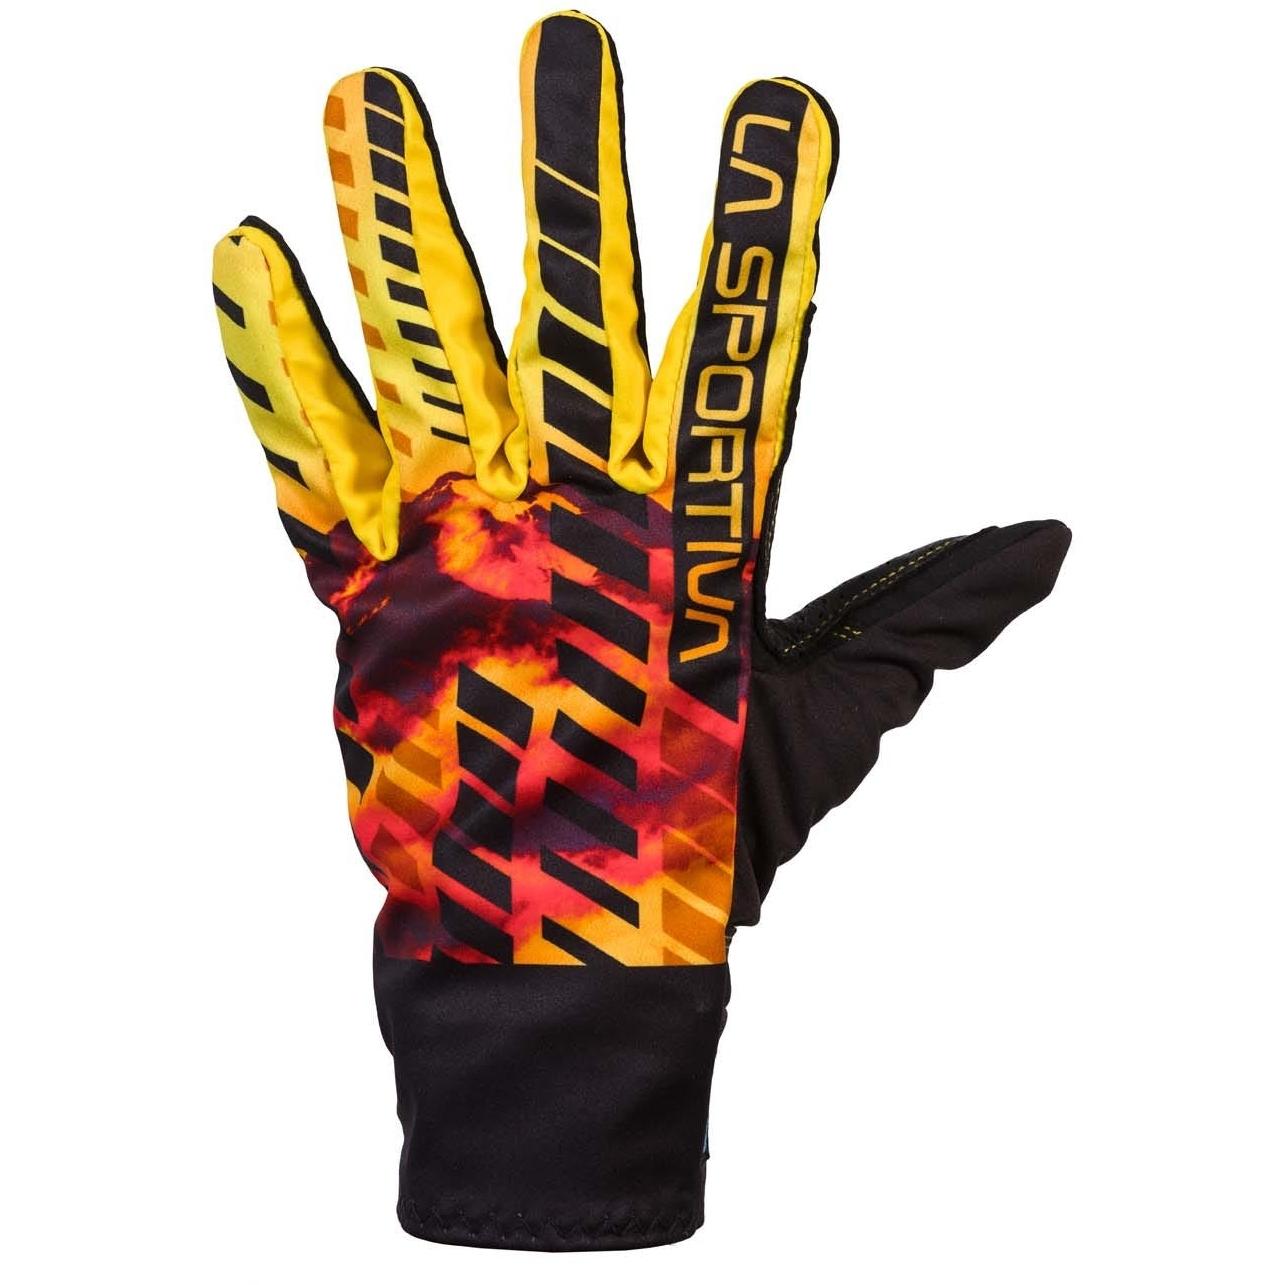 La Sportiva Skimo Race Gloves - Black/Yellow